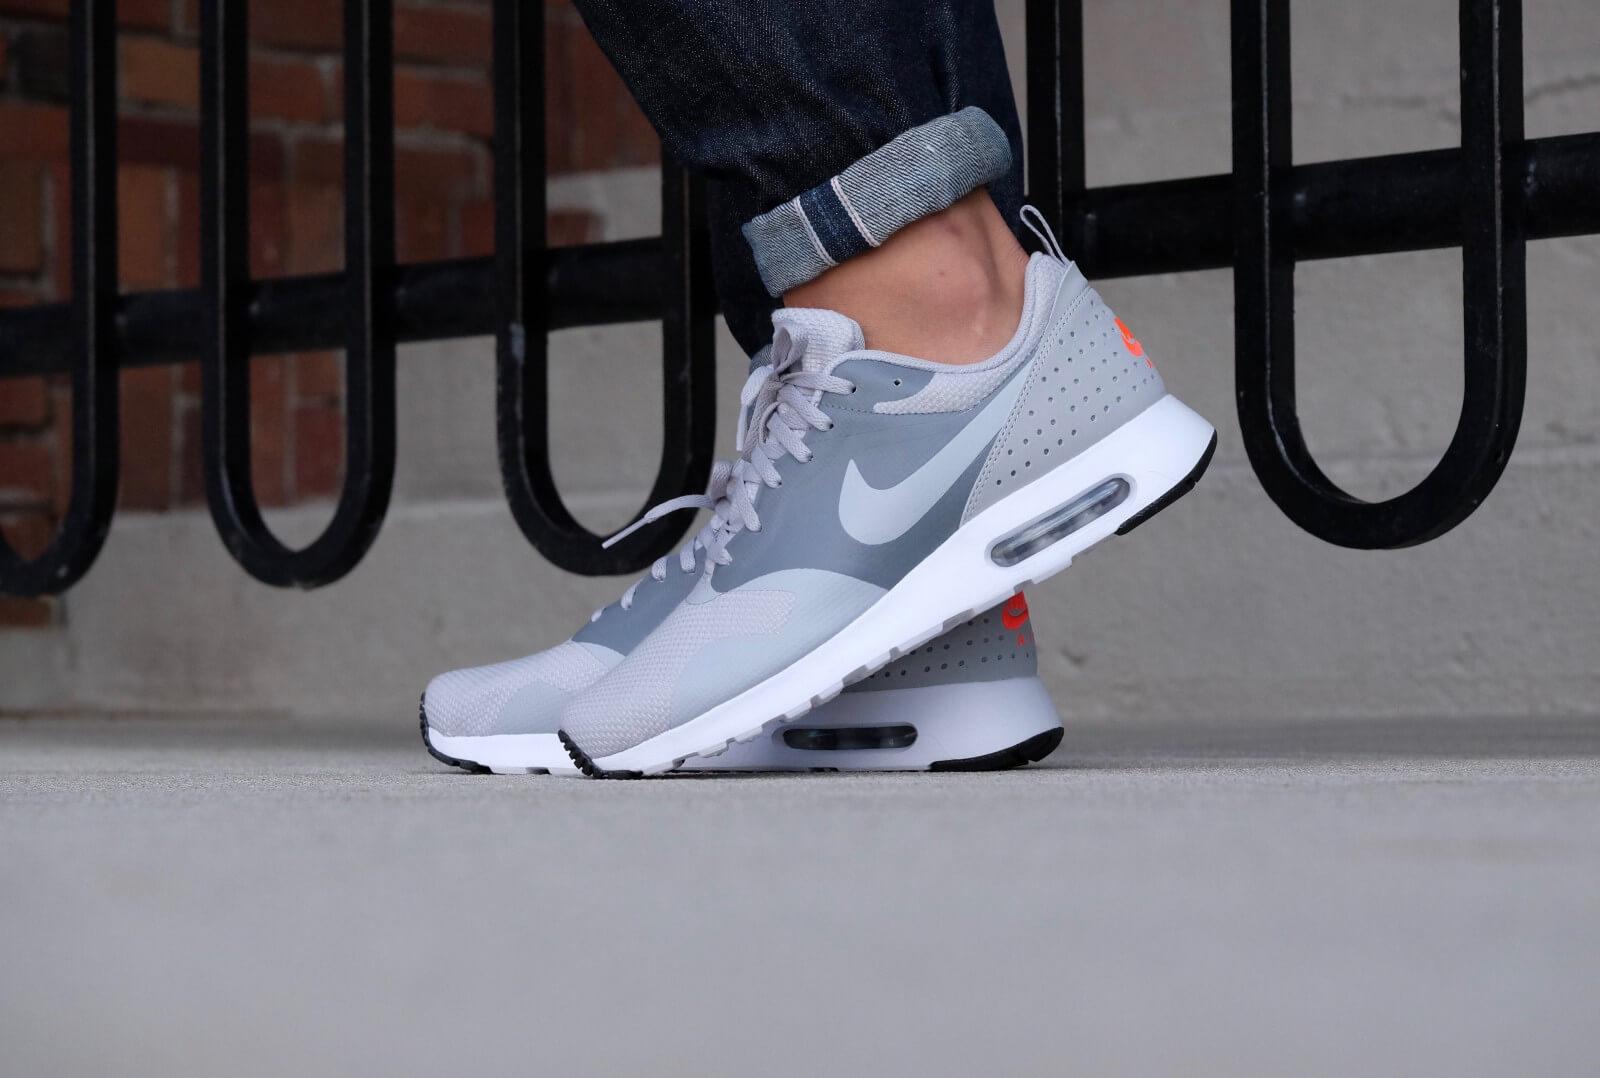 sports shoes 5ffee f88b3 ... where to buy nike air max tavas se wolf grey wolf grey cool grey c0fe4  d74b4